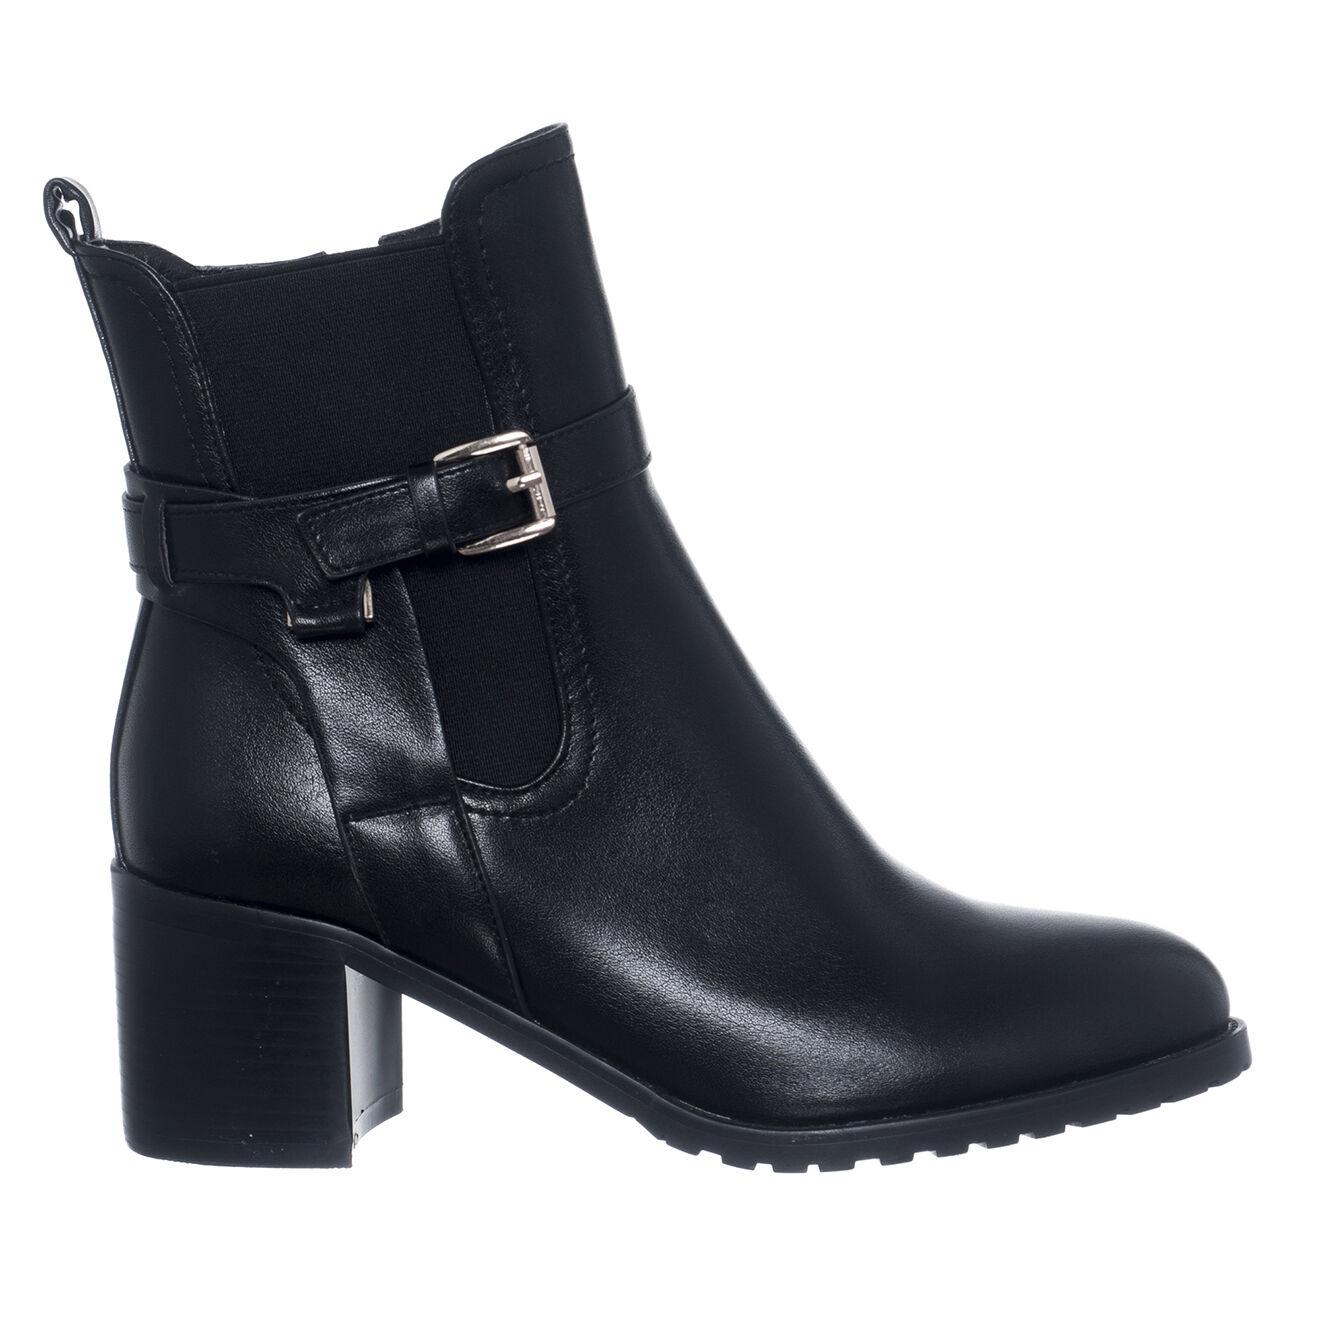 Chelsea boots Cassandre noires - Talon 6 cm - Loretta by Loretta - Modalova